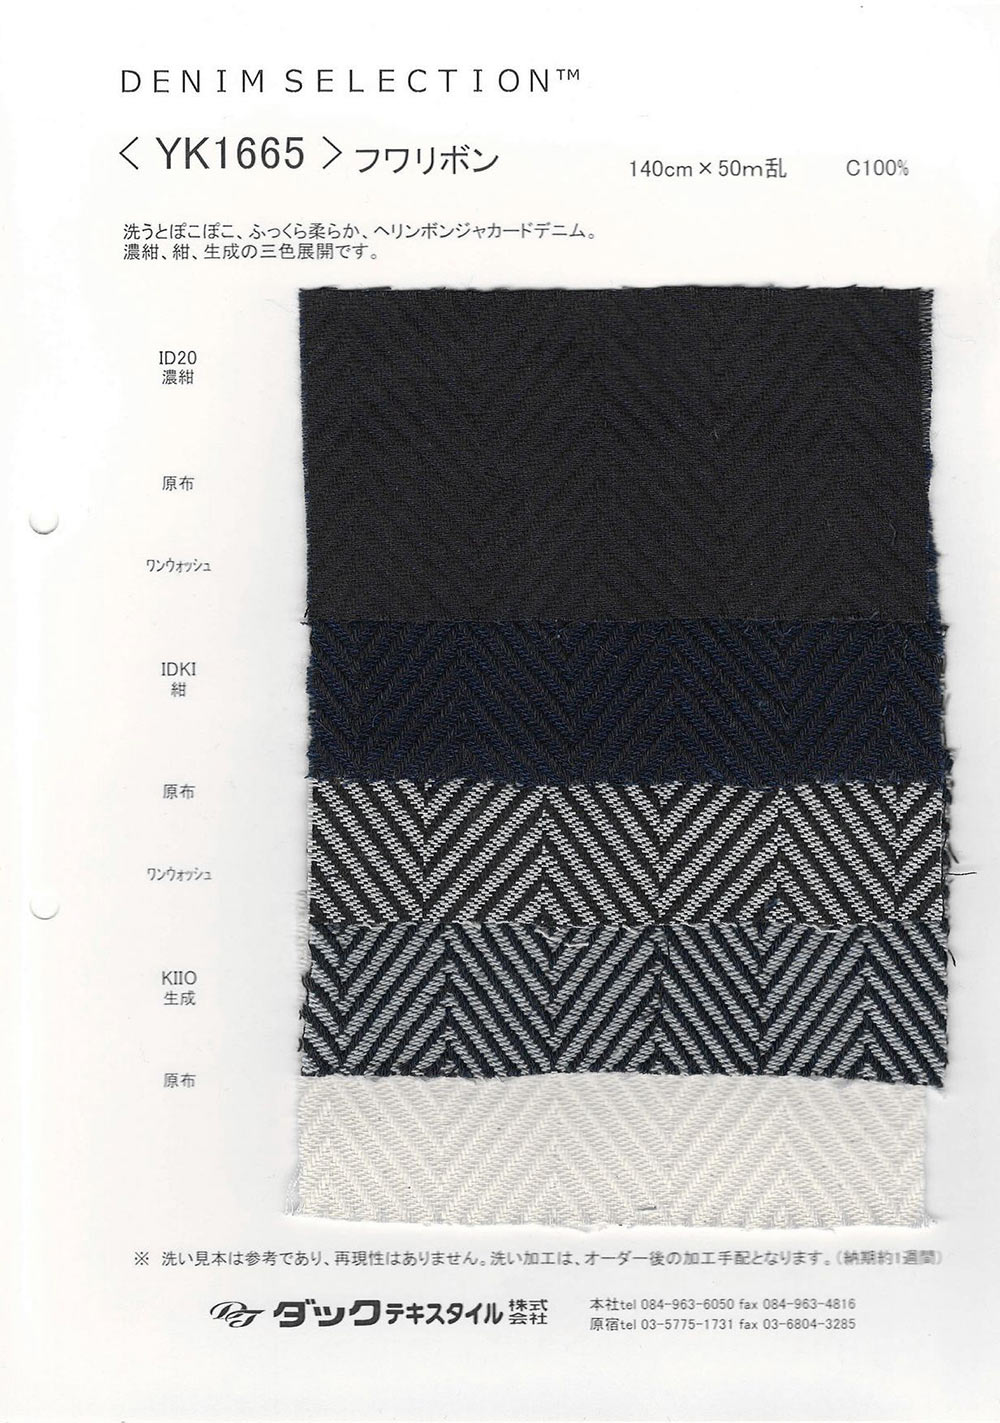 YK1665 フワリボン[生地] ダックテキスタイル/オークラ商事 - ApparelX アパレル資材卸通販